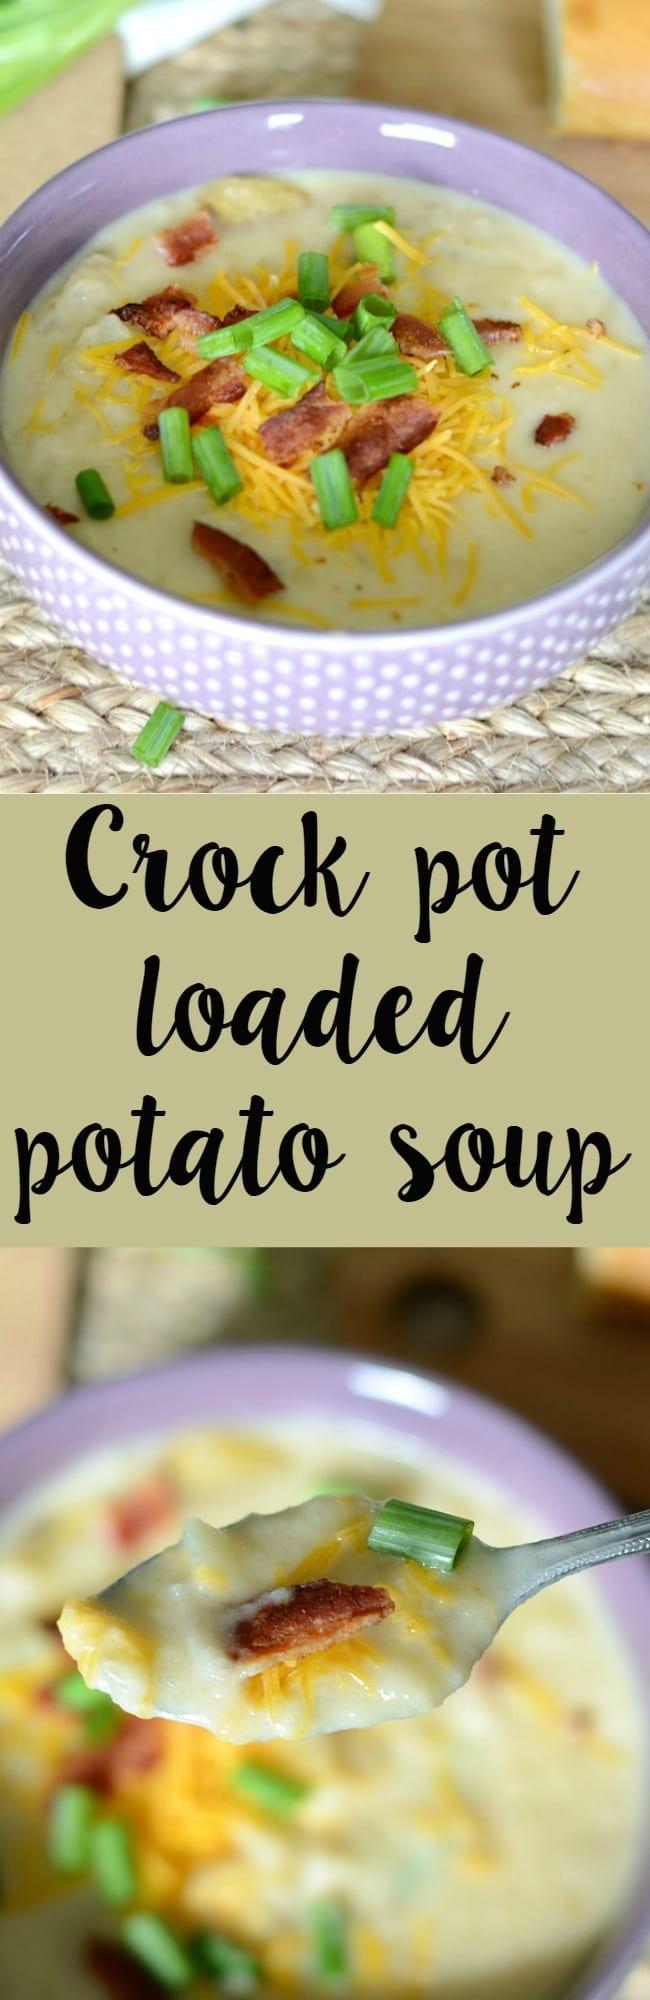 Crock pot loaded potato soup recipe